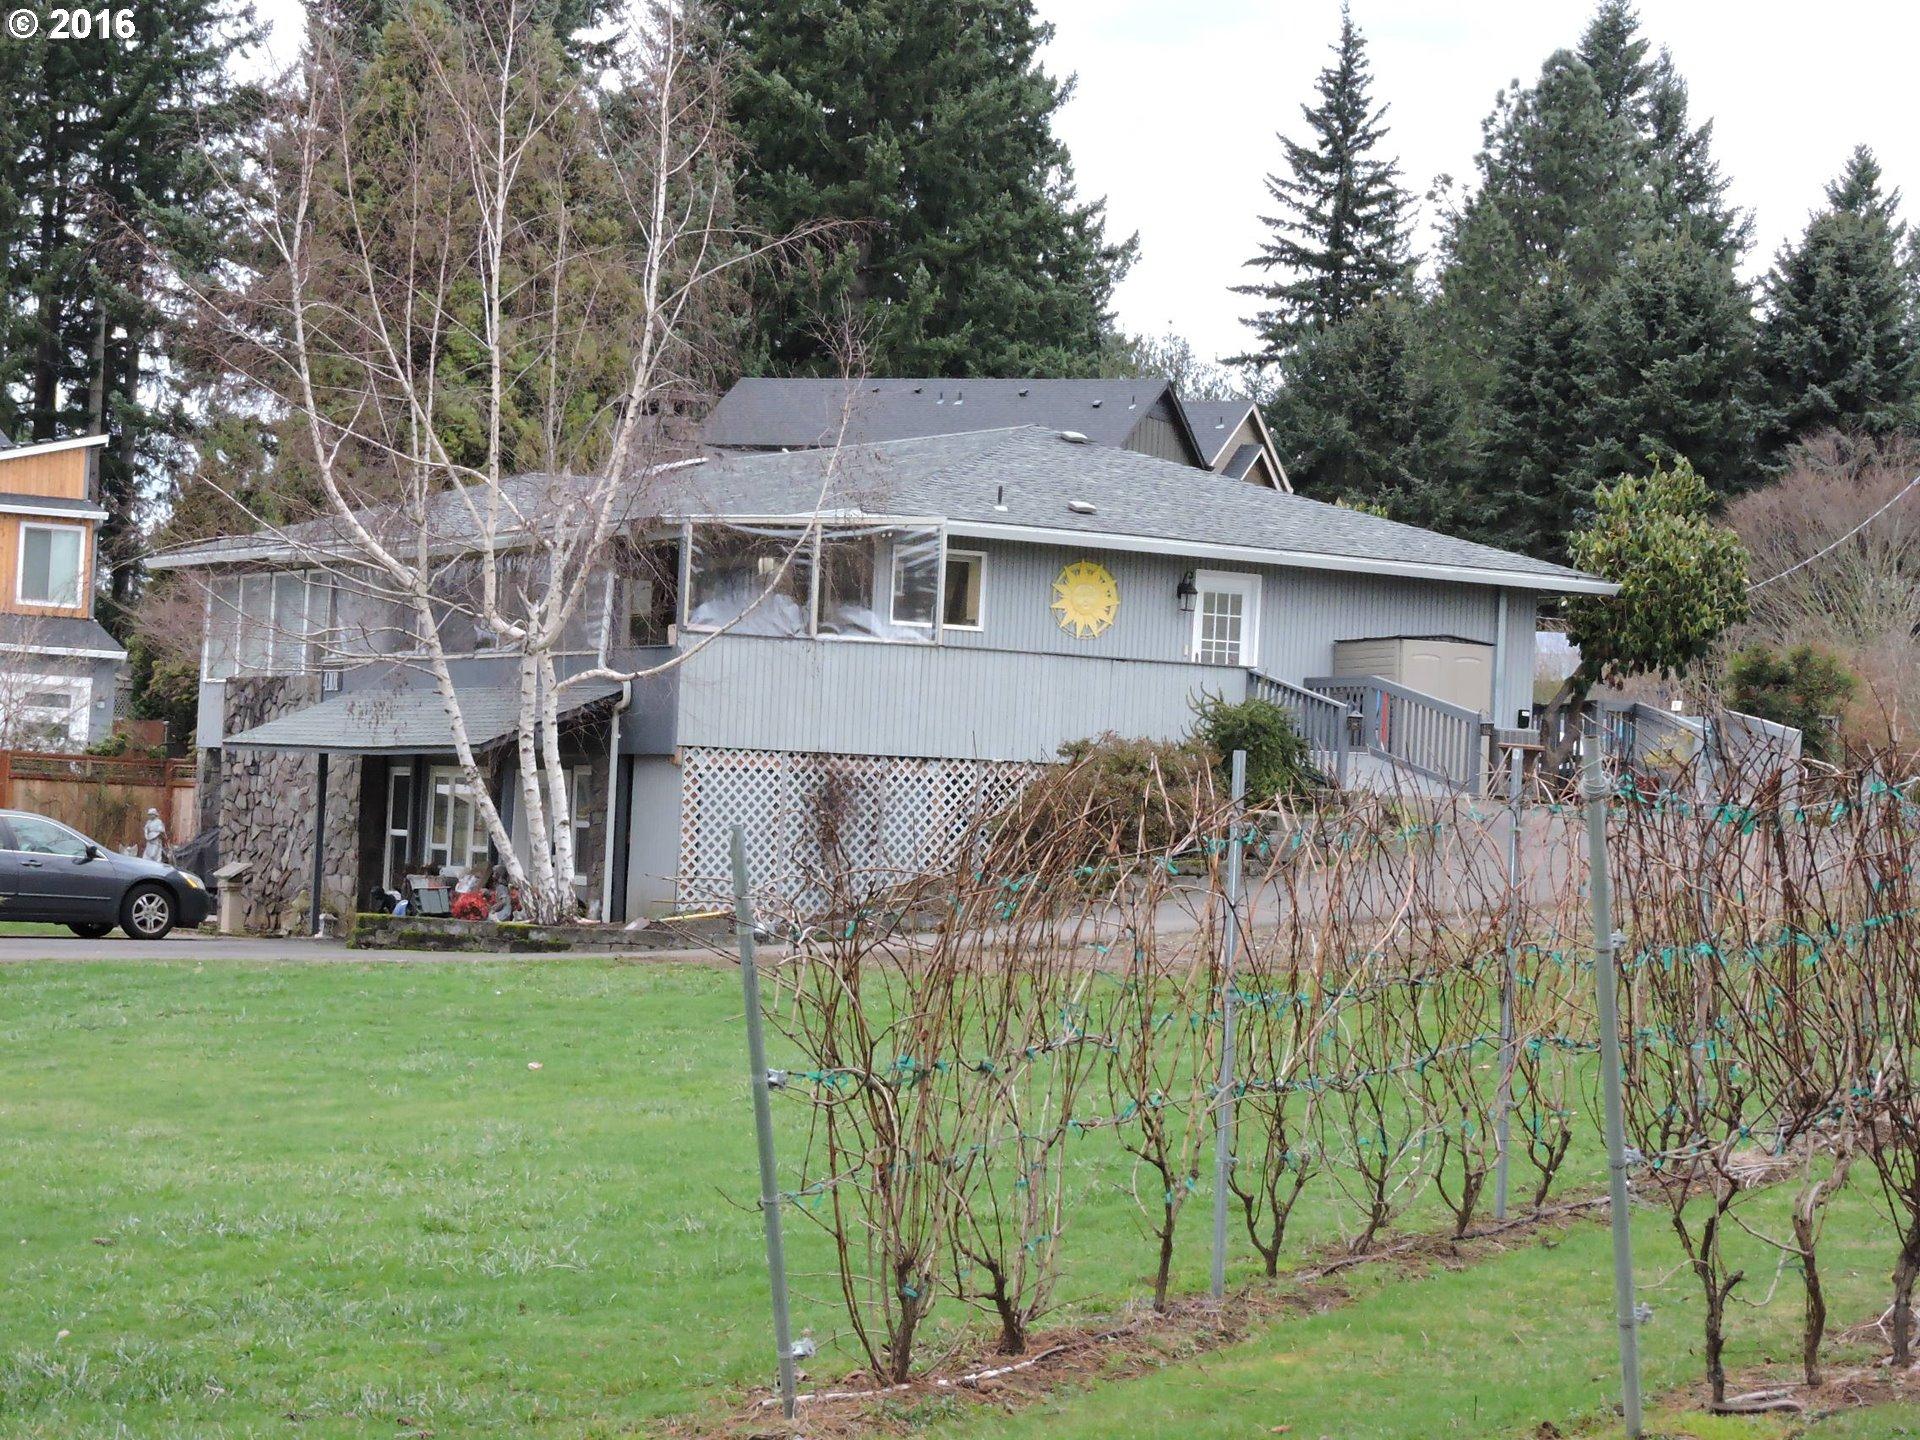 4101 SE 168TH AVE, Vancouver, WA 98683